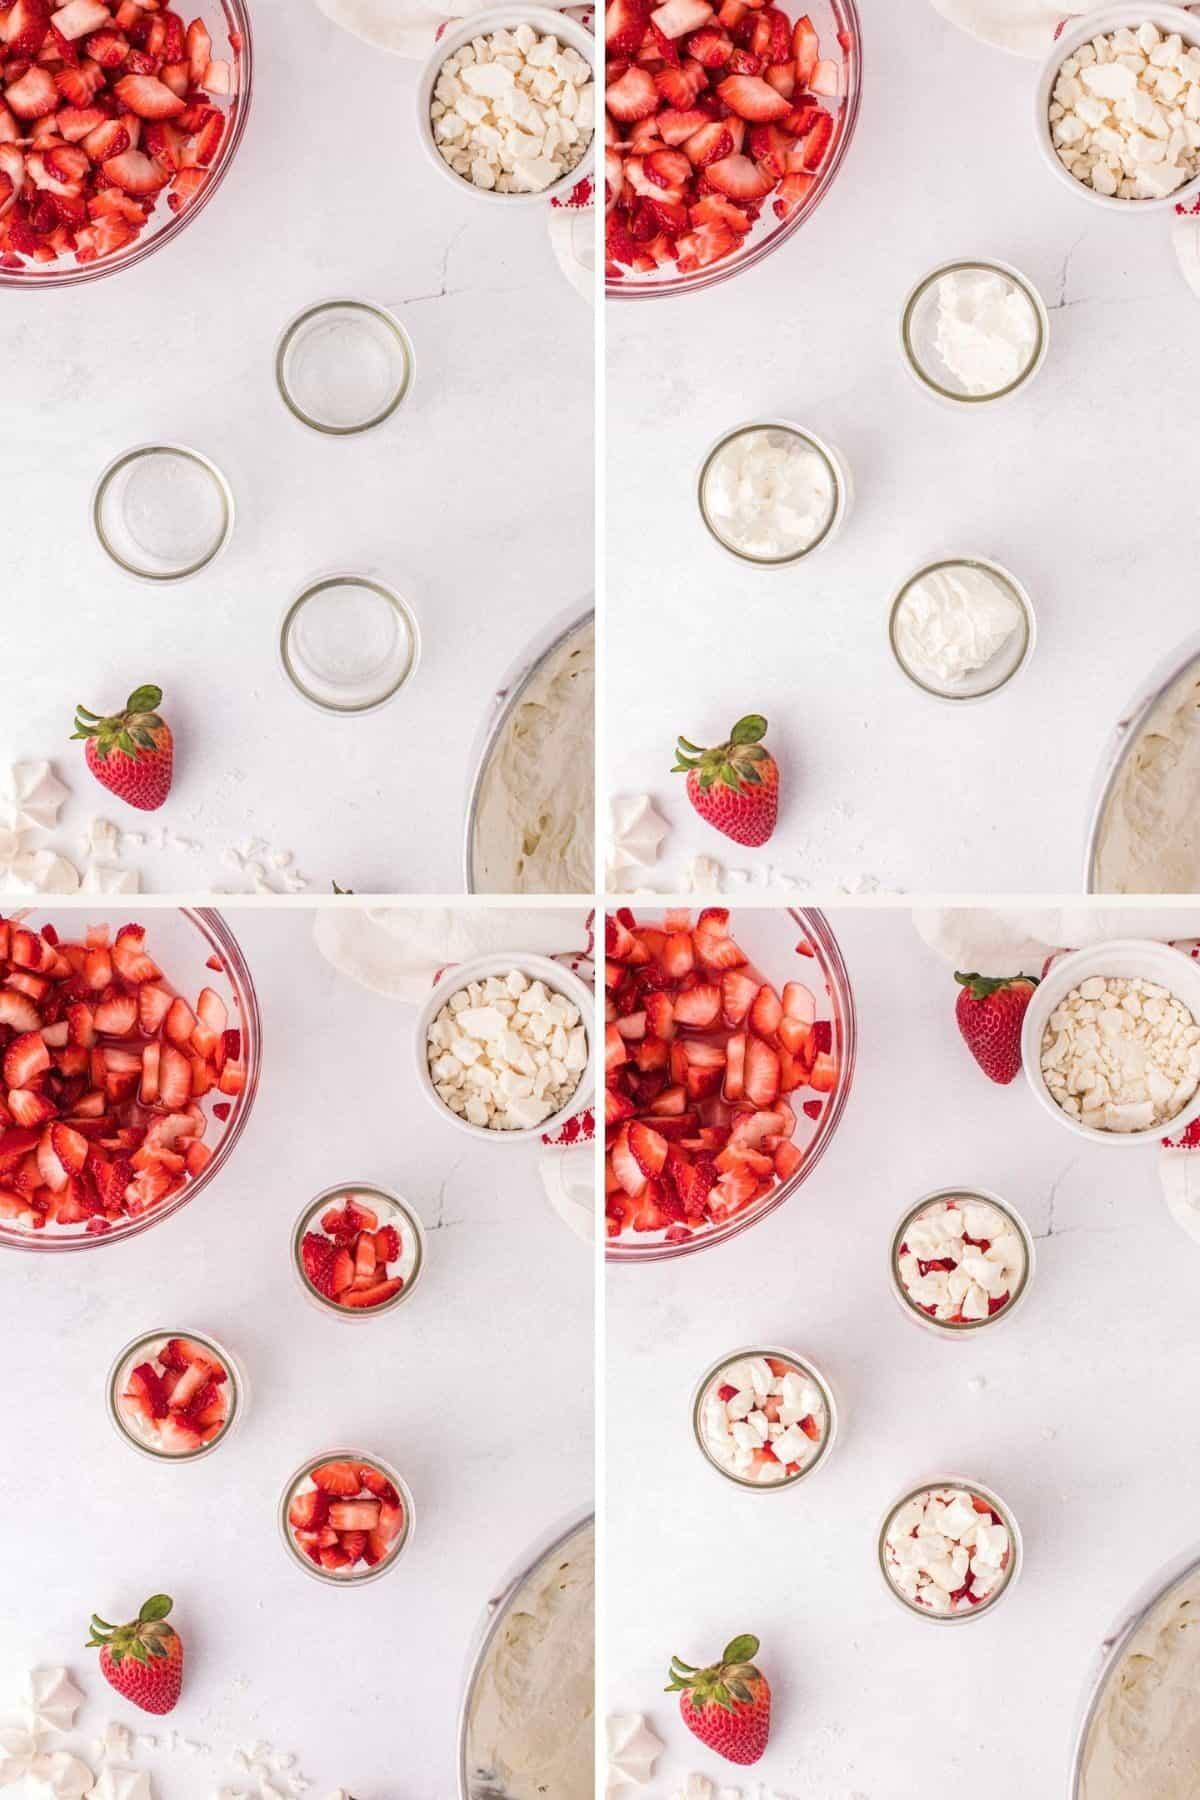 assembling strawberries and cream dessert